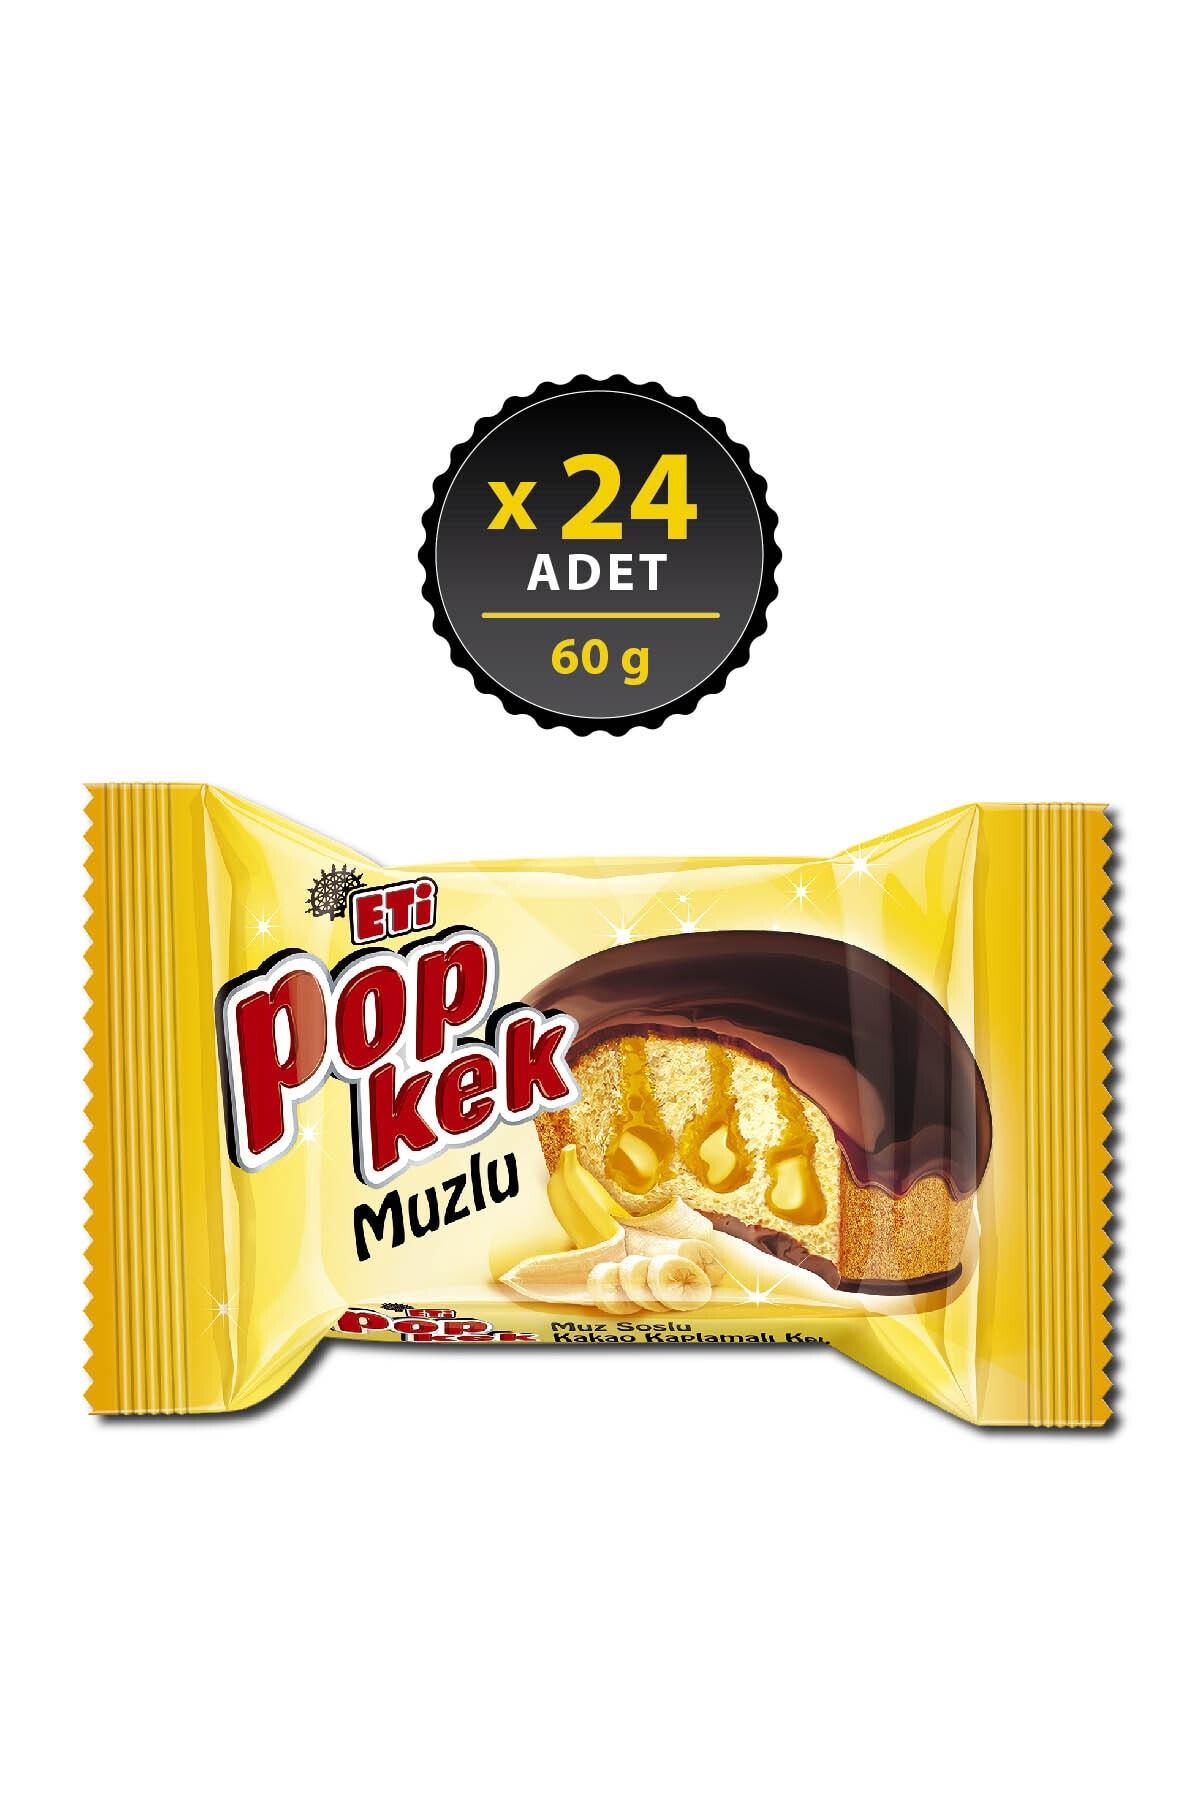 Eti Popkek Muzlu 60 G X 24 Adet 1